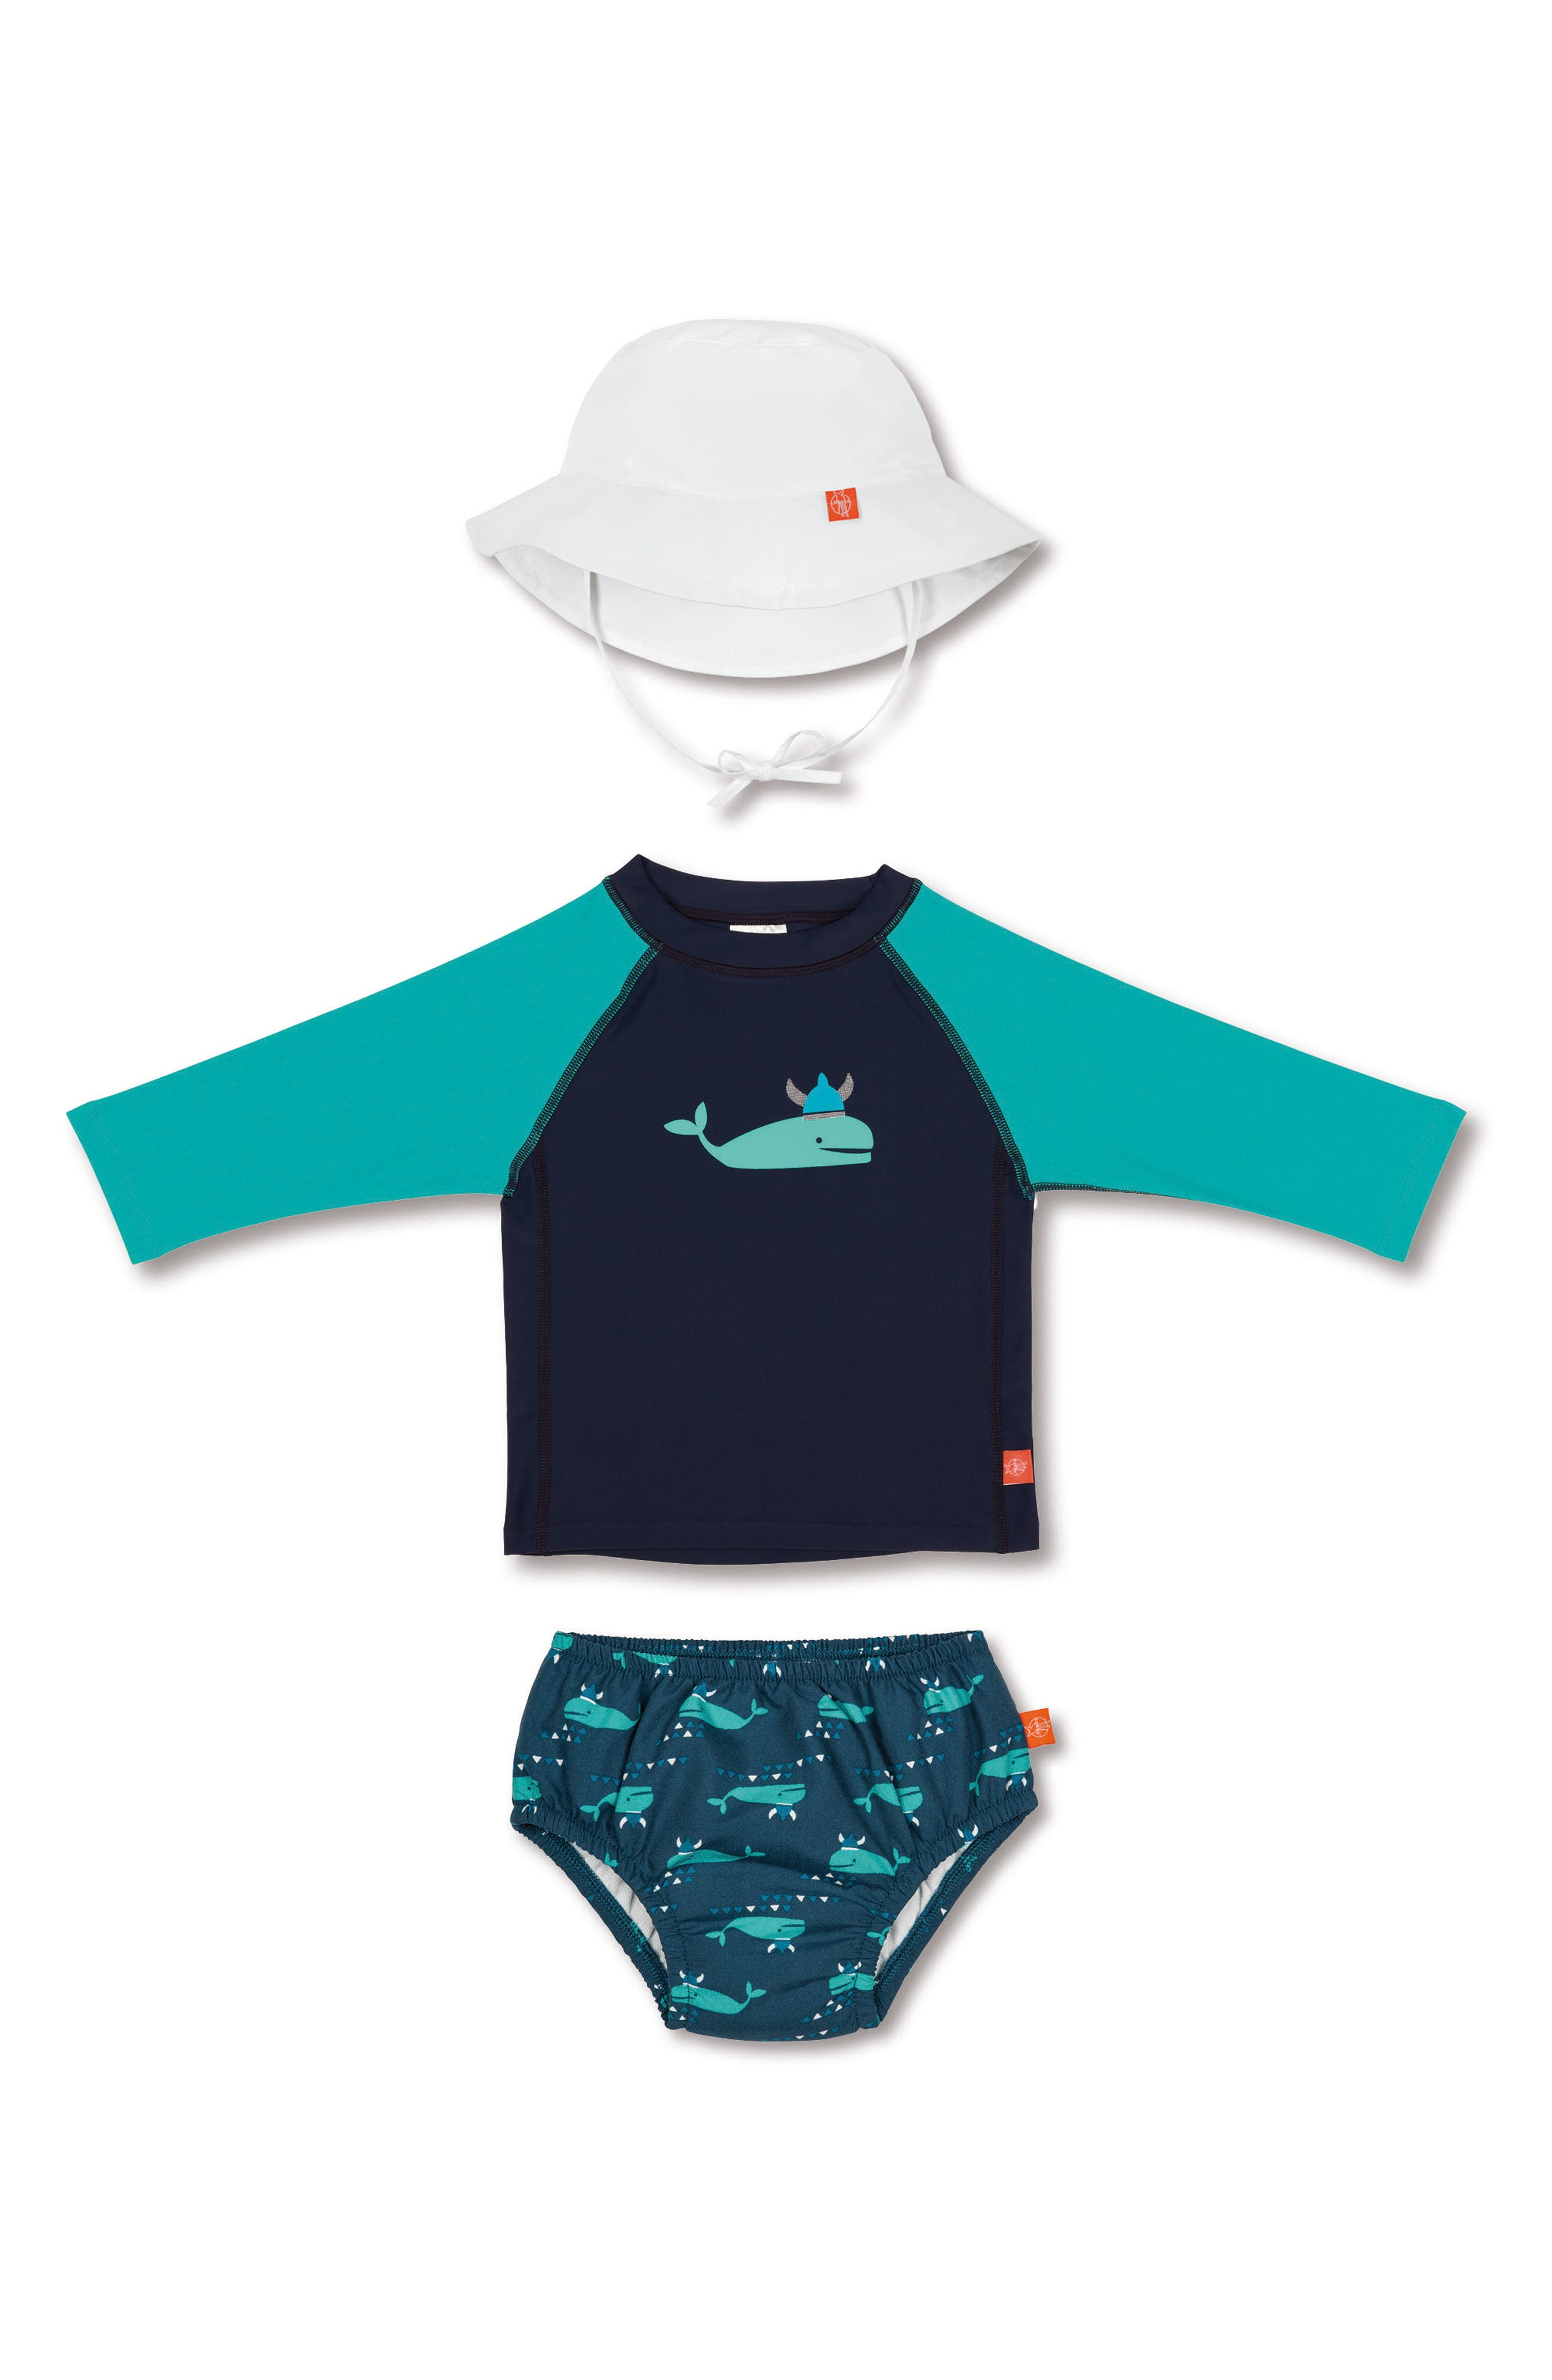 Alternate Image 1 Selected - Lassig Two-Piece Rashguard Swimsuit & Hat Set (Baby & Toddler)